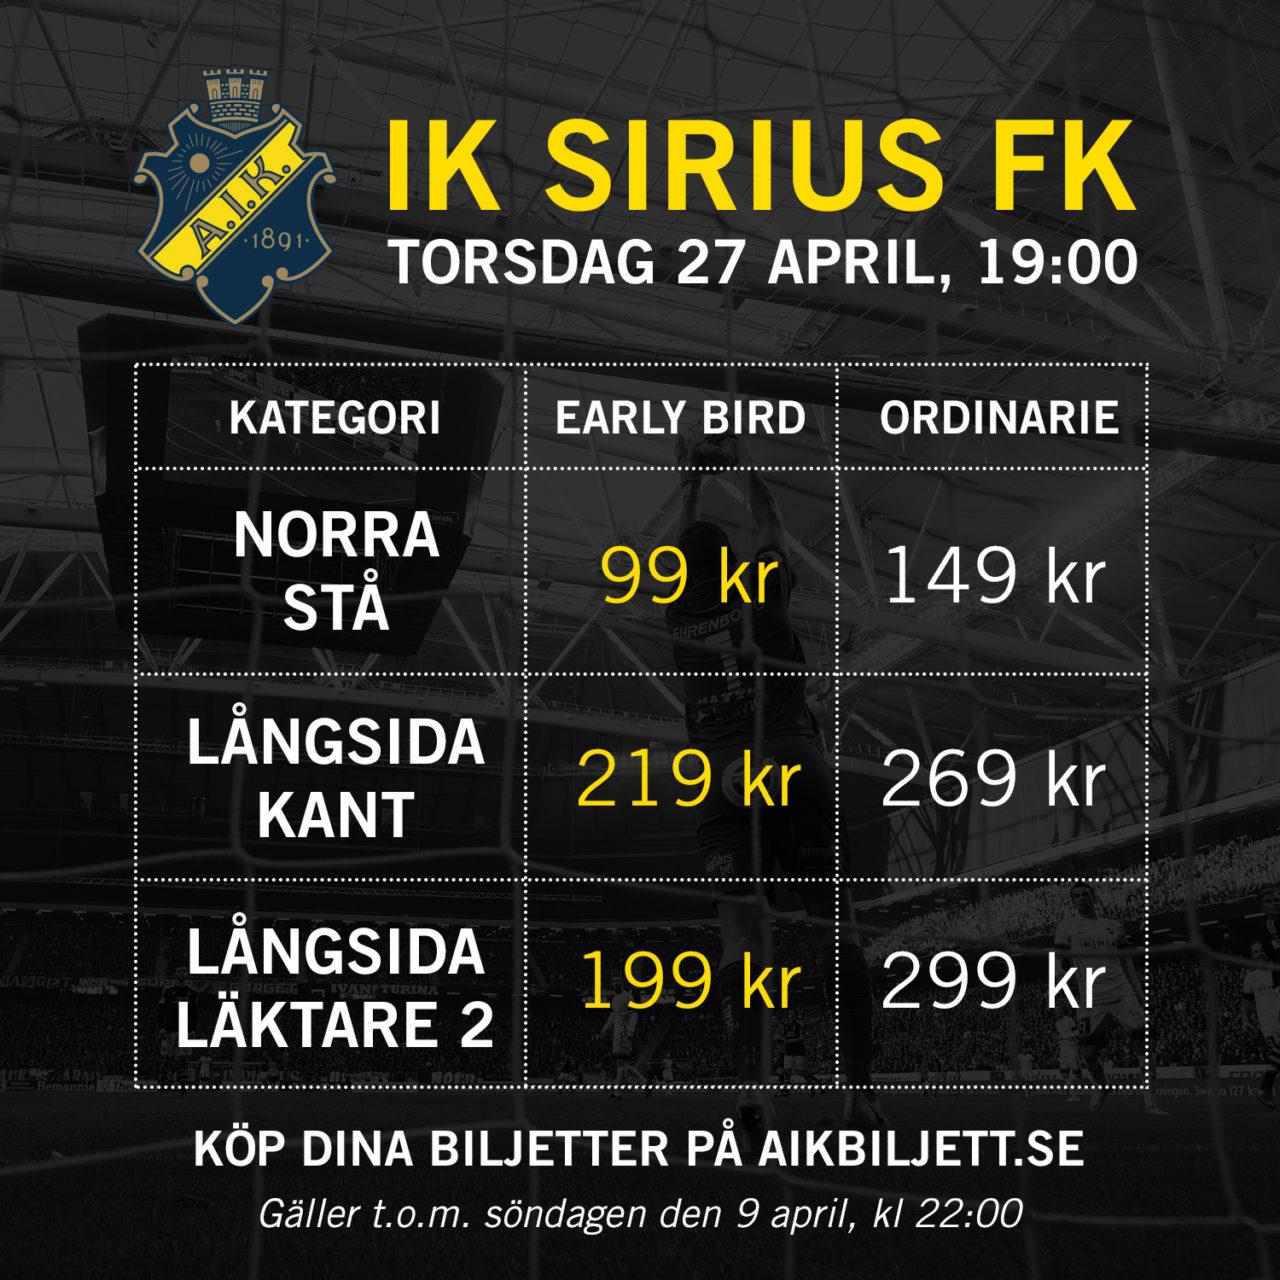 AIK-Sirius (Early Bird)